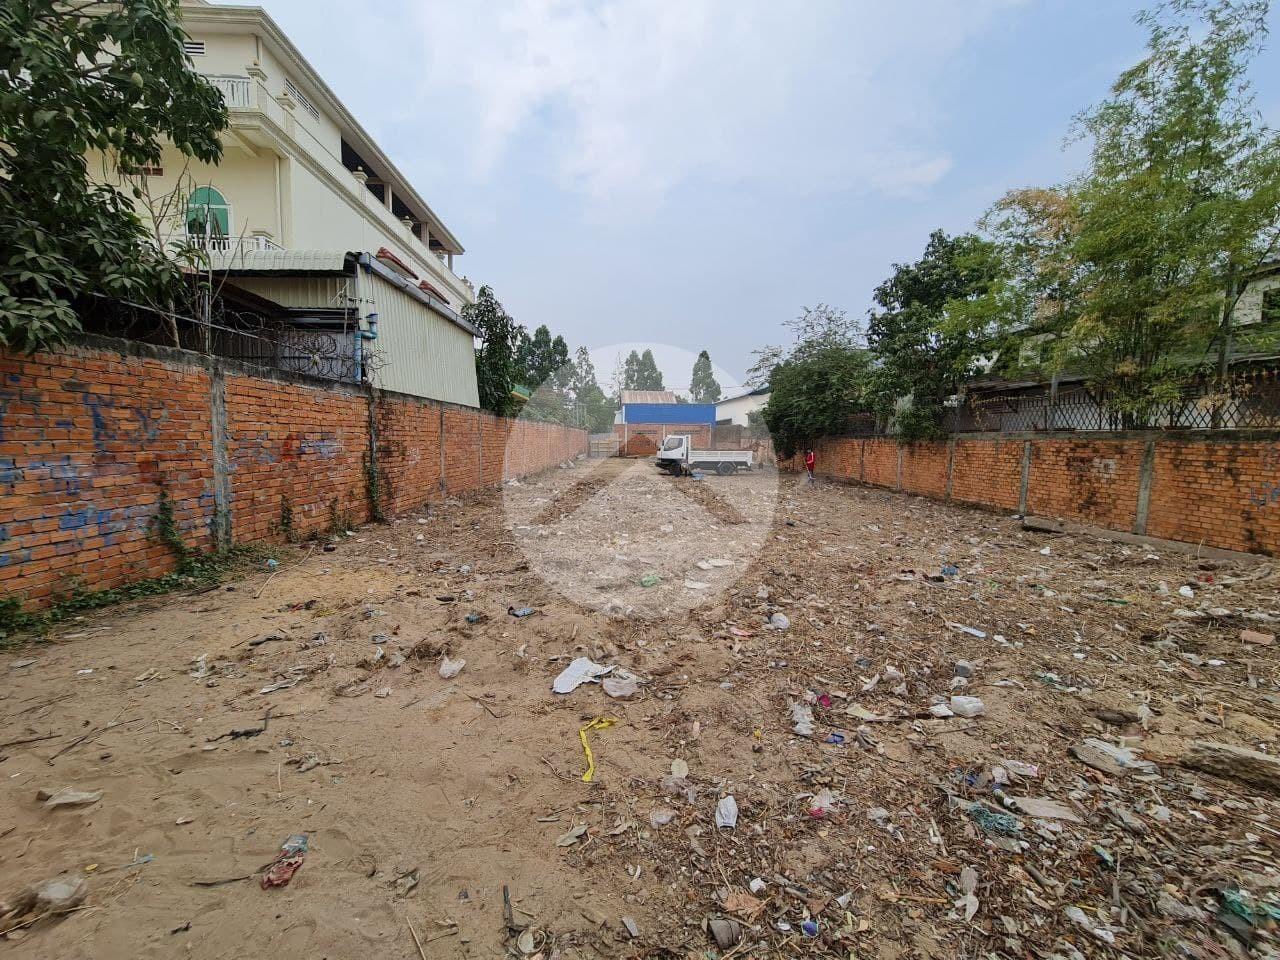 700 Sqm Commercial Land For Sale - Khan Por Sen Chey, Phnom Penh